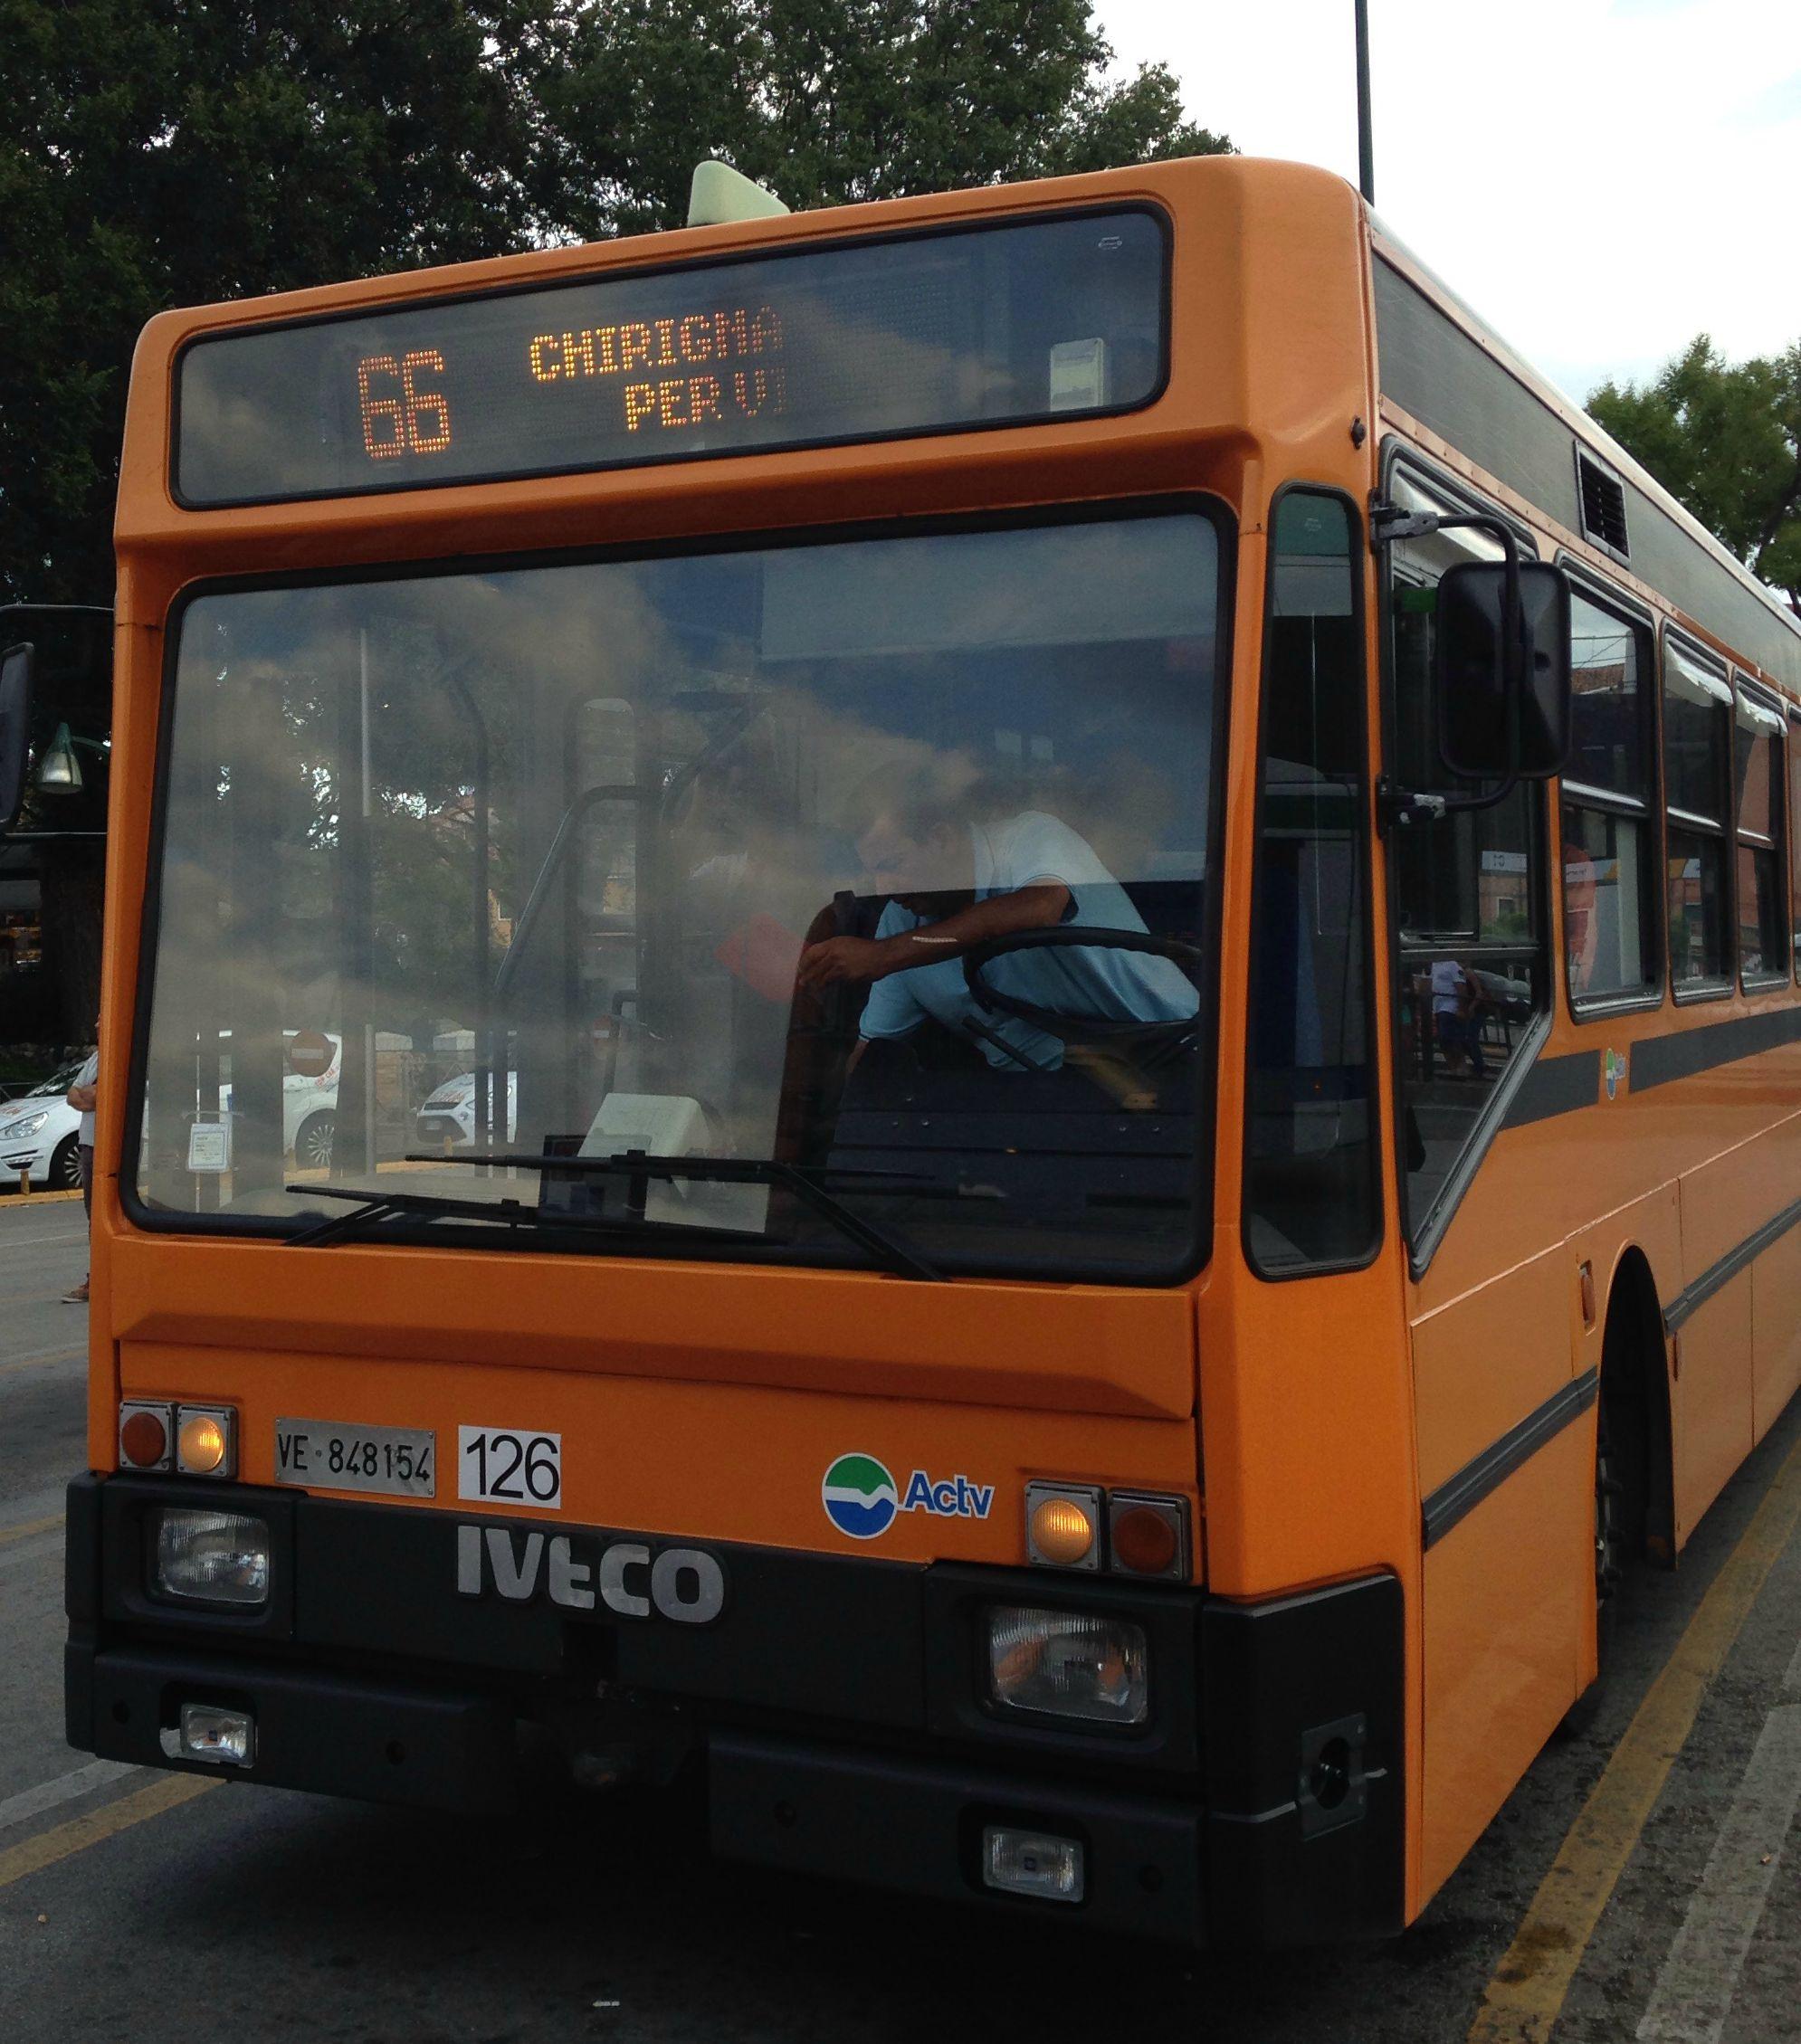 Iveco_480.12.21_Turbocity_U_ACTV_Venice,